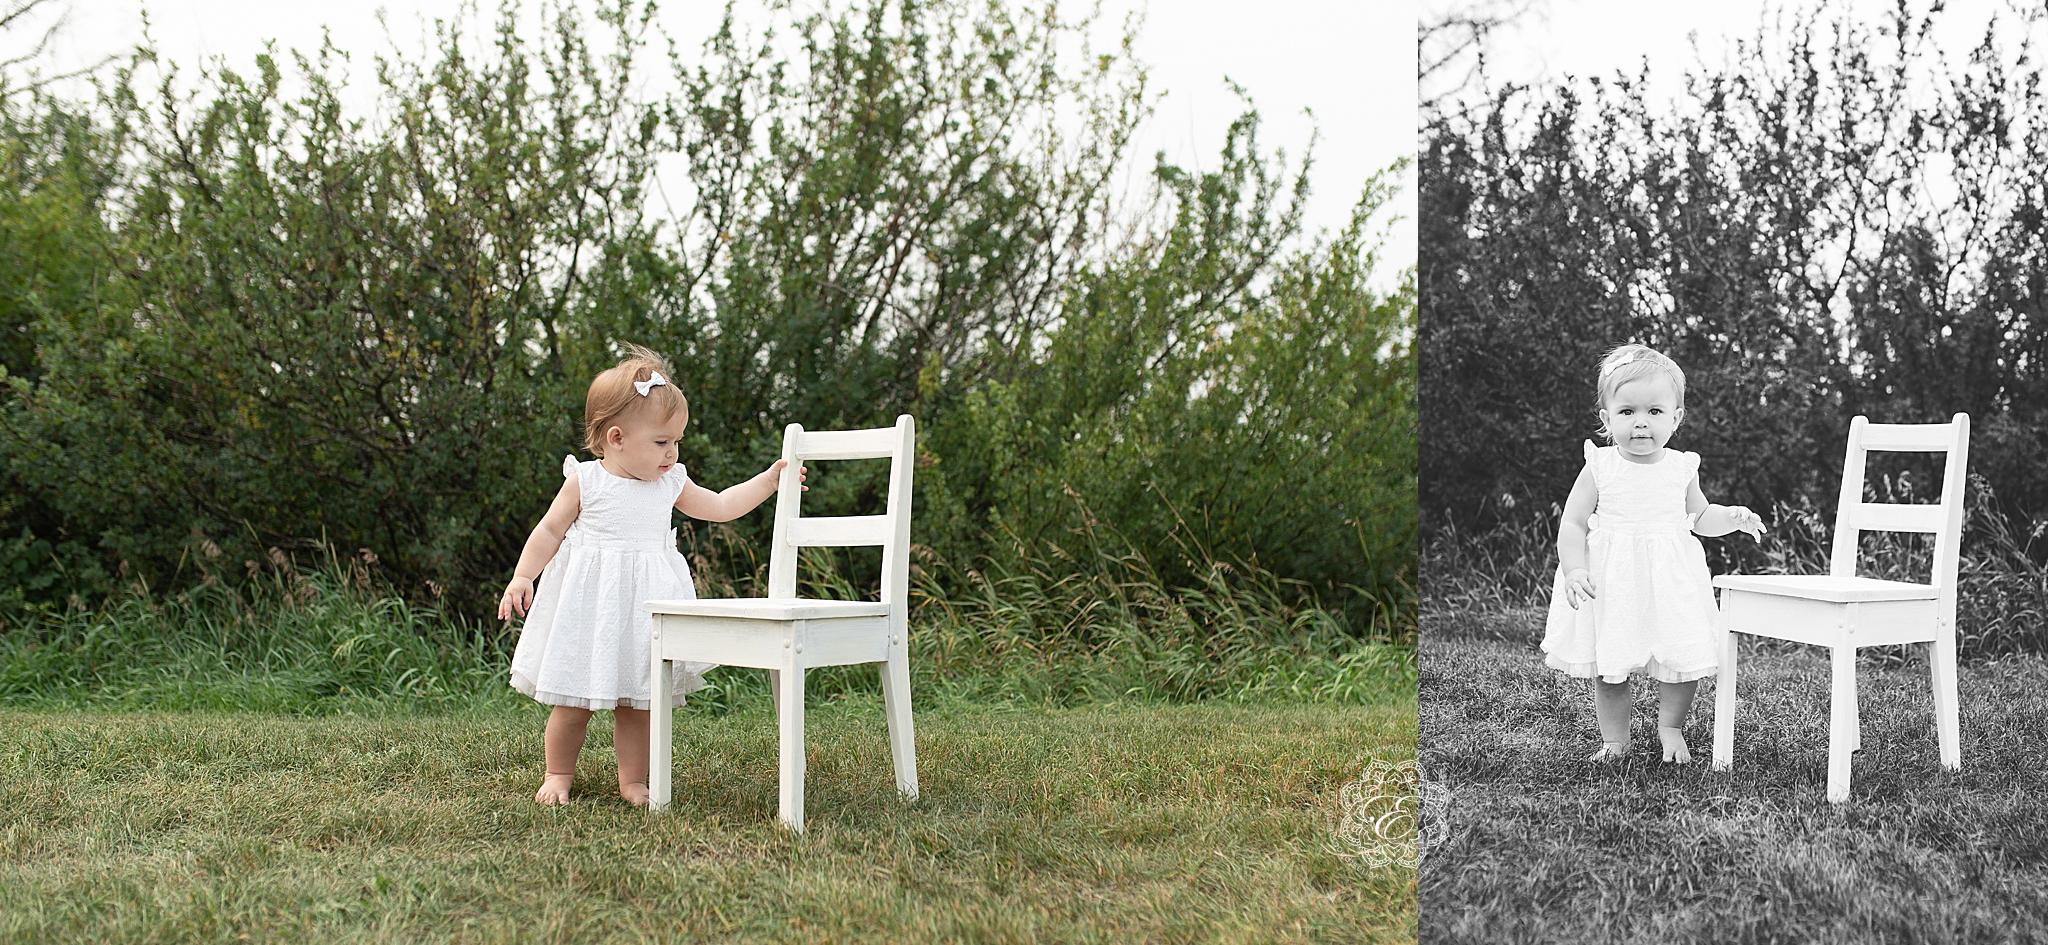 one-year-milestone-photography-edmonton.jpg